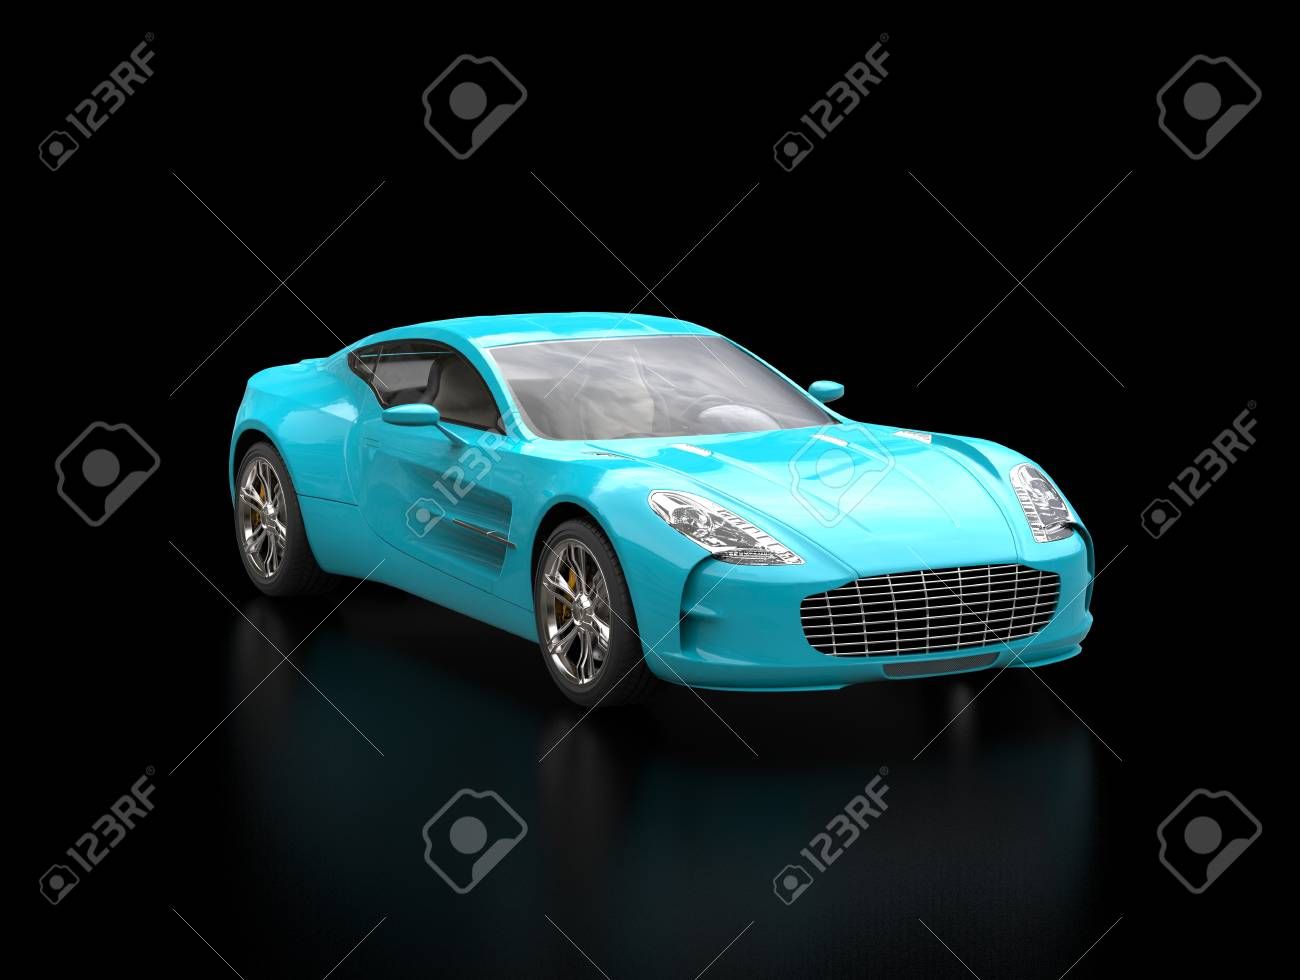 Bright Blue Sportscar On Black Background Blurry Reflection Stock